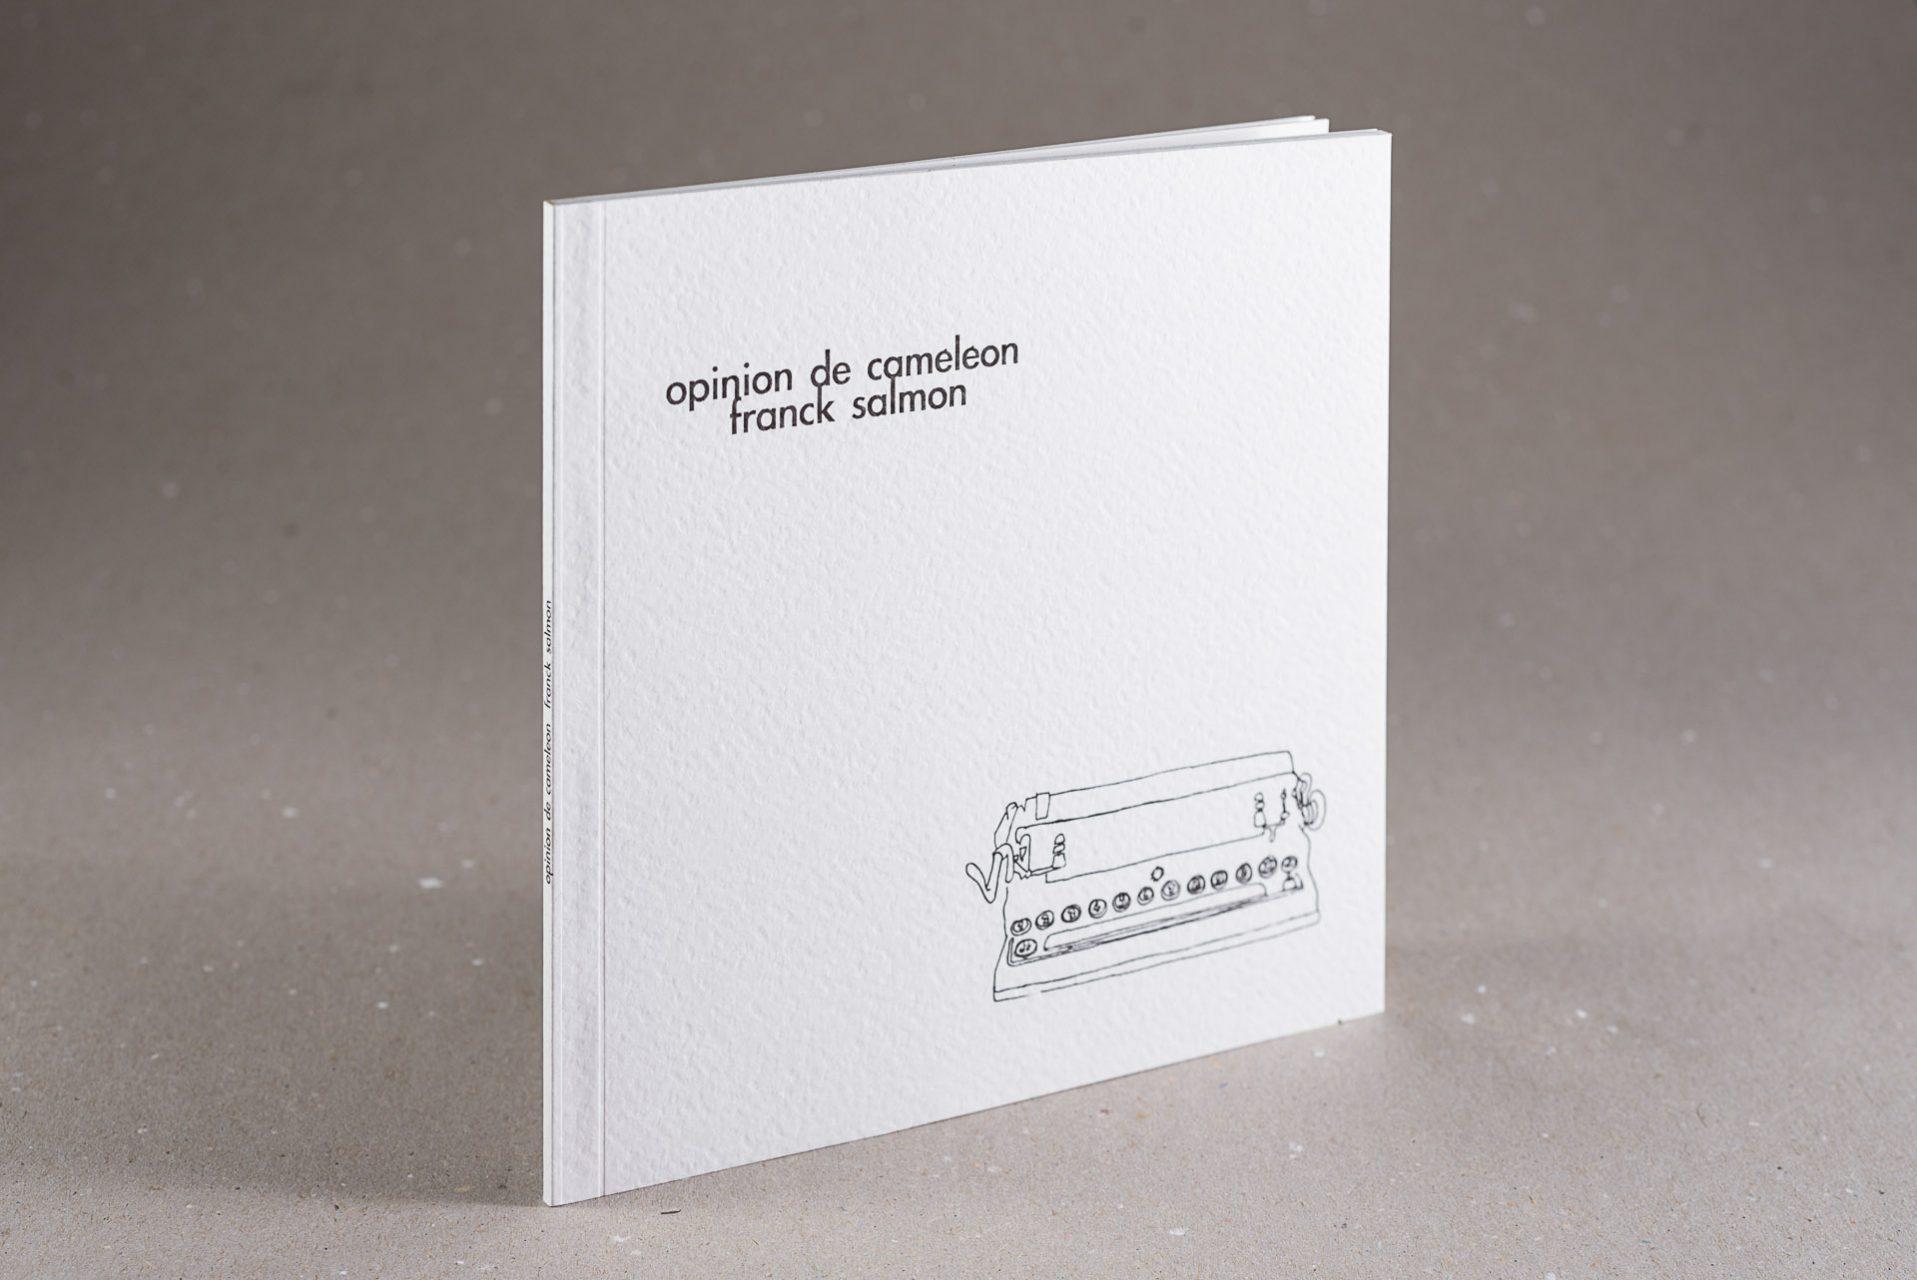 web-hd-nuit-myrtide-livre-opinion-de-cameleon-franck-salmon-01